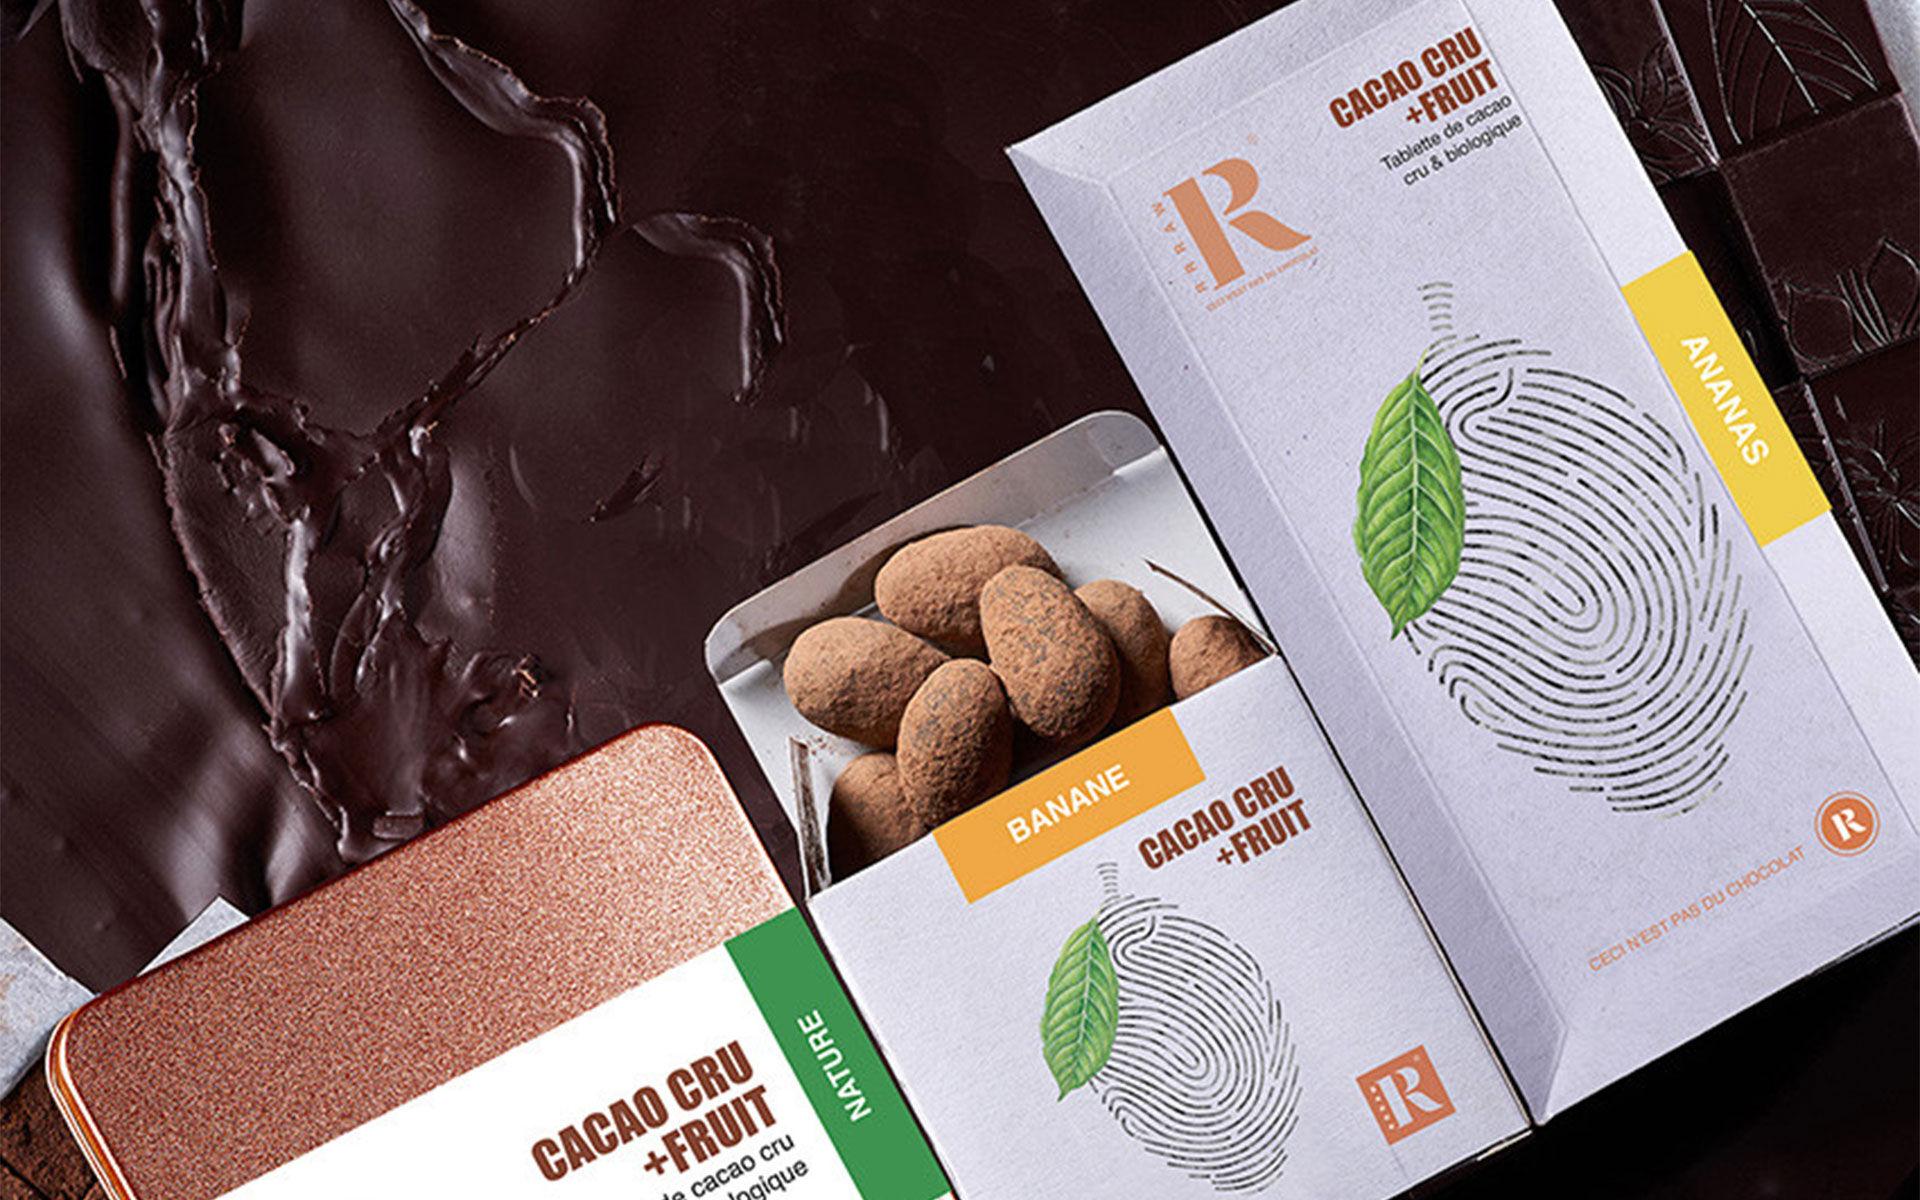 Rrraw Cacao